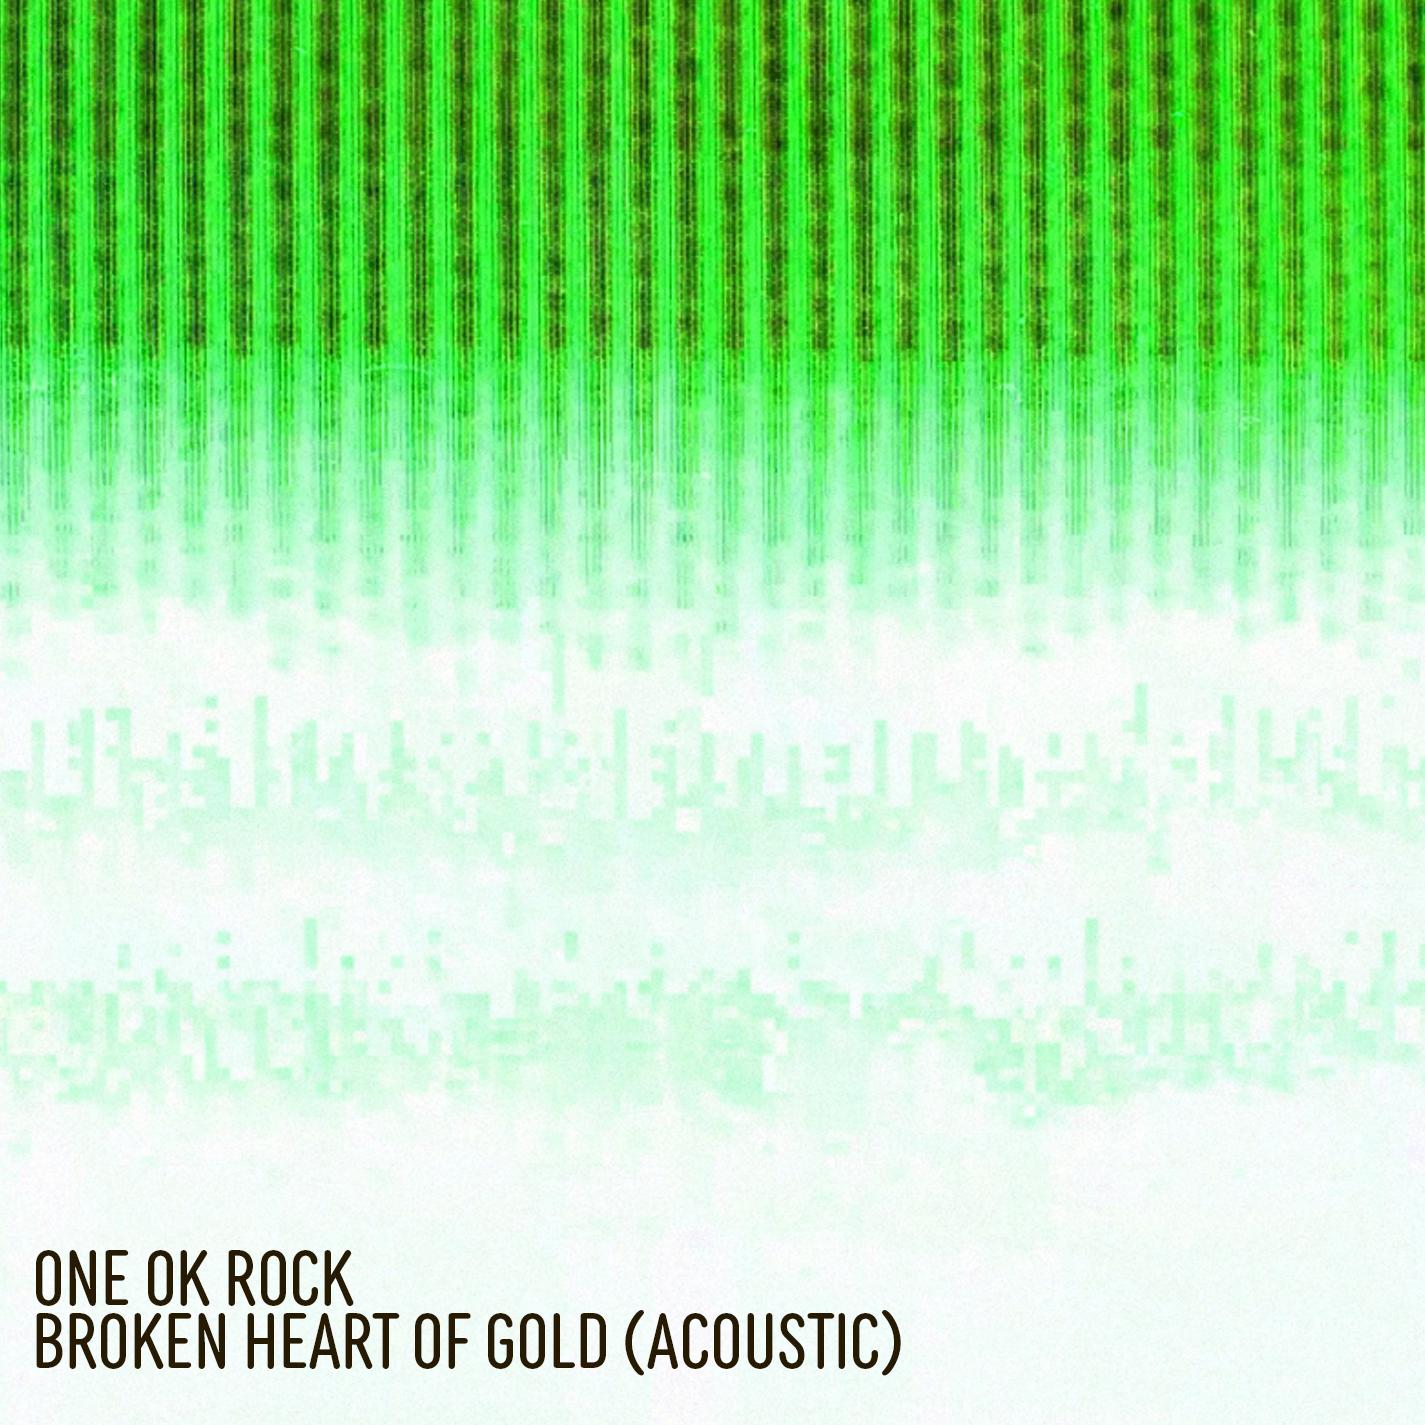 ONE OK ROCK – Broken Heart of Gold (Acoustic) [24bit Lossless + MP3 320 / WEB] [2021.07.02]